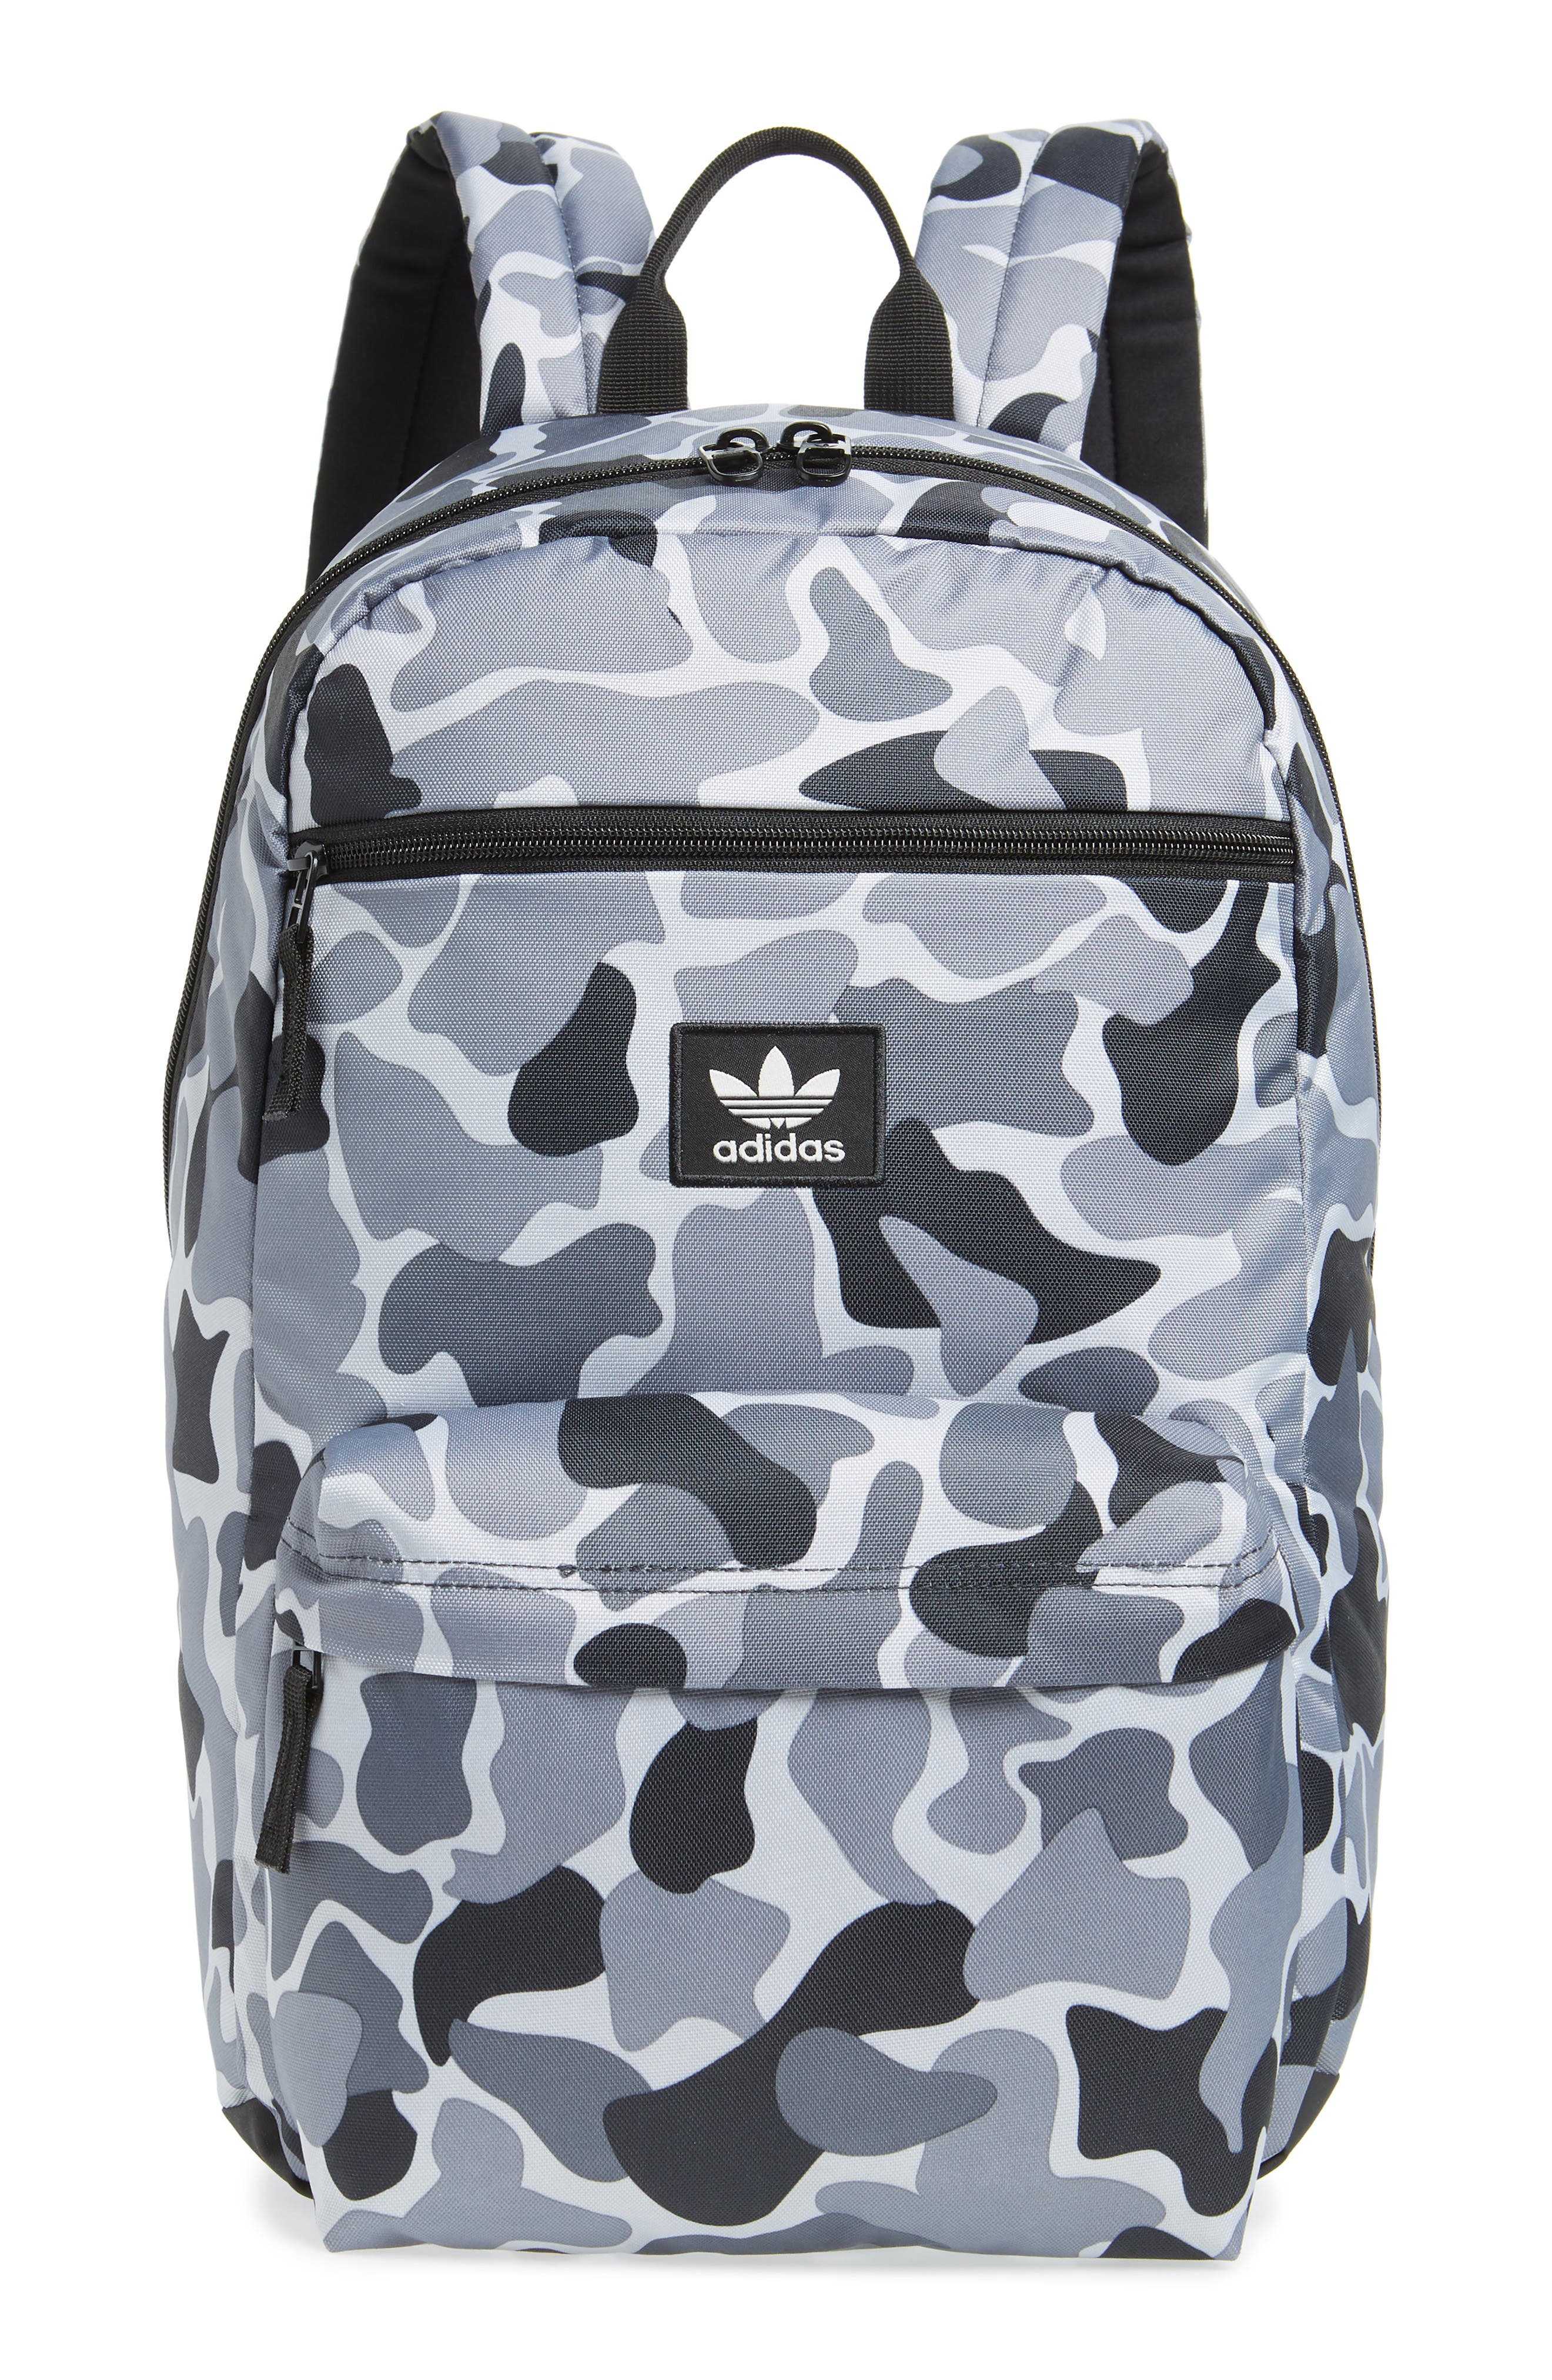 Adidas Original National Backpack -